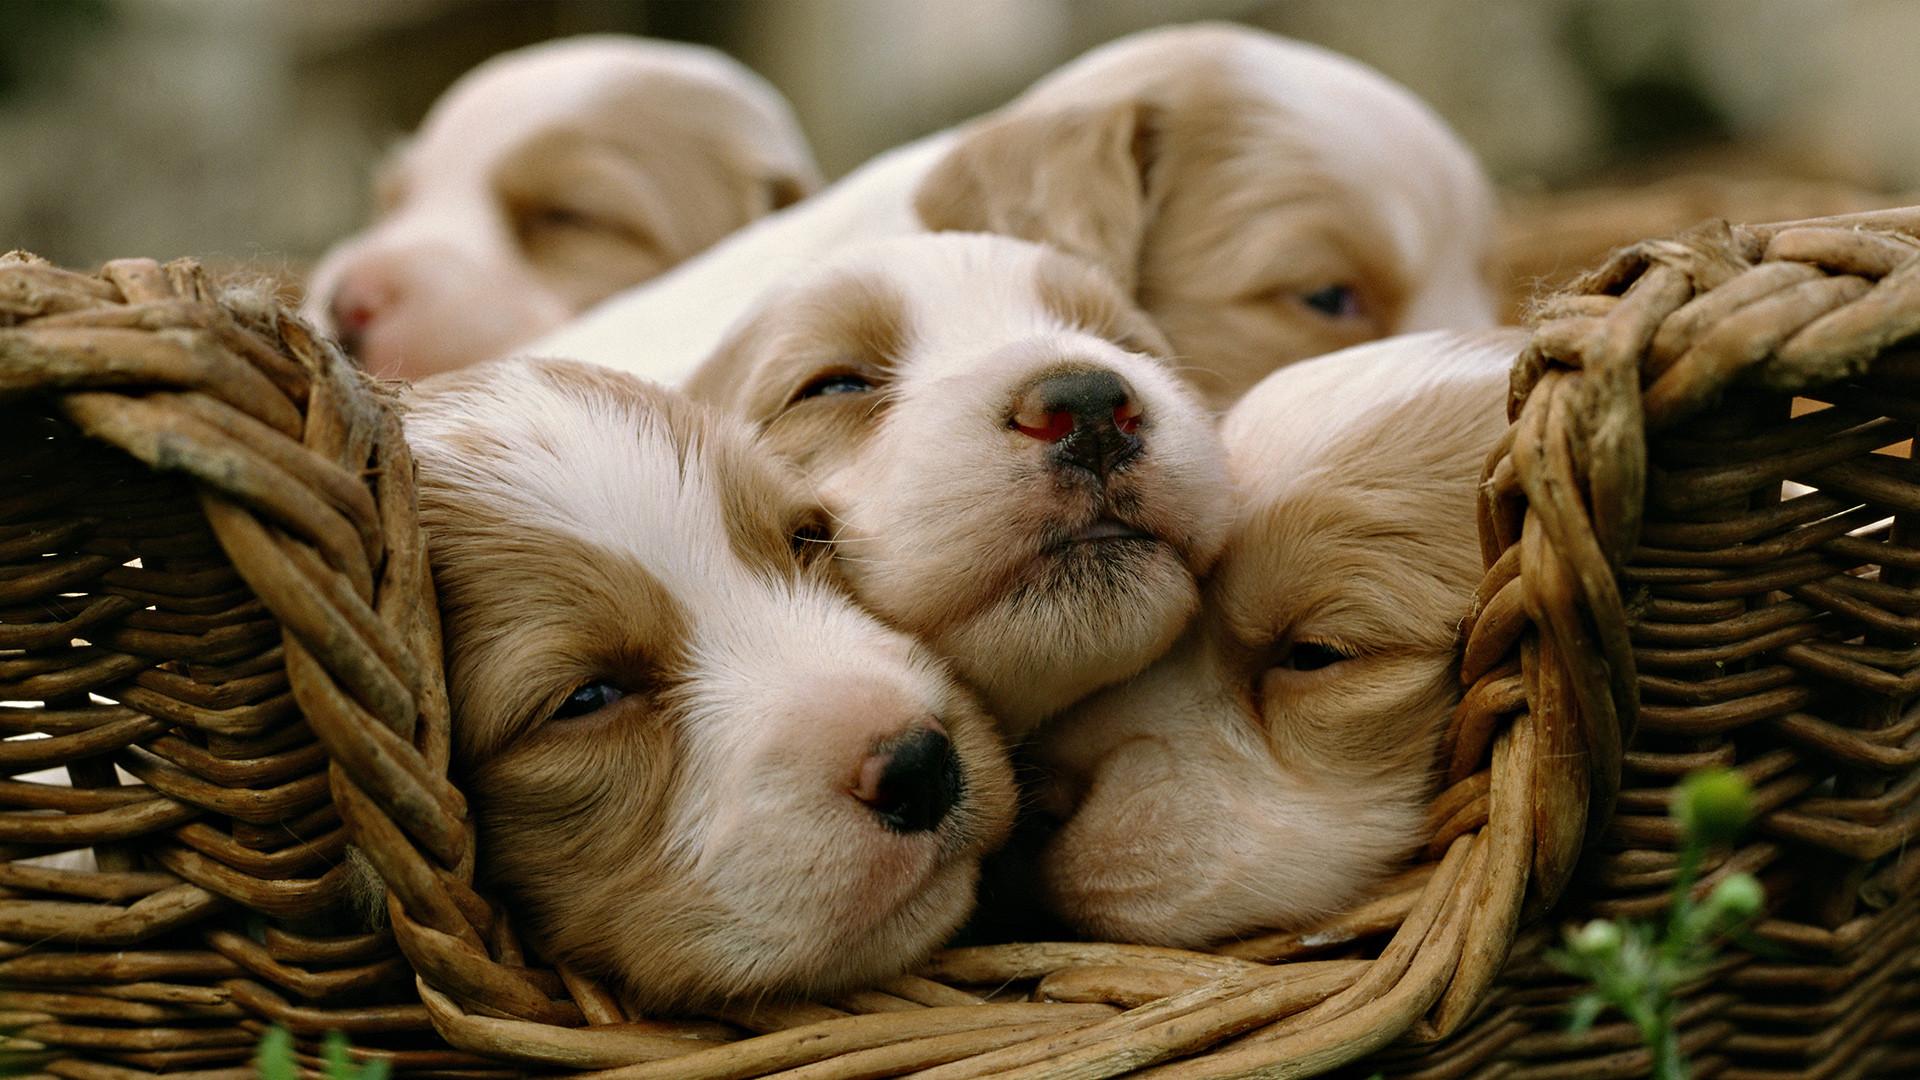 Download Wallpaper Of Cute Puppies Cute Baby Animal Wallpapers Pixelstalk Net